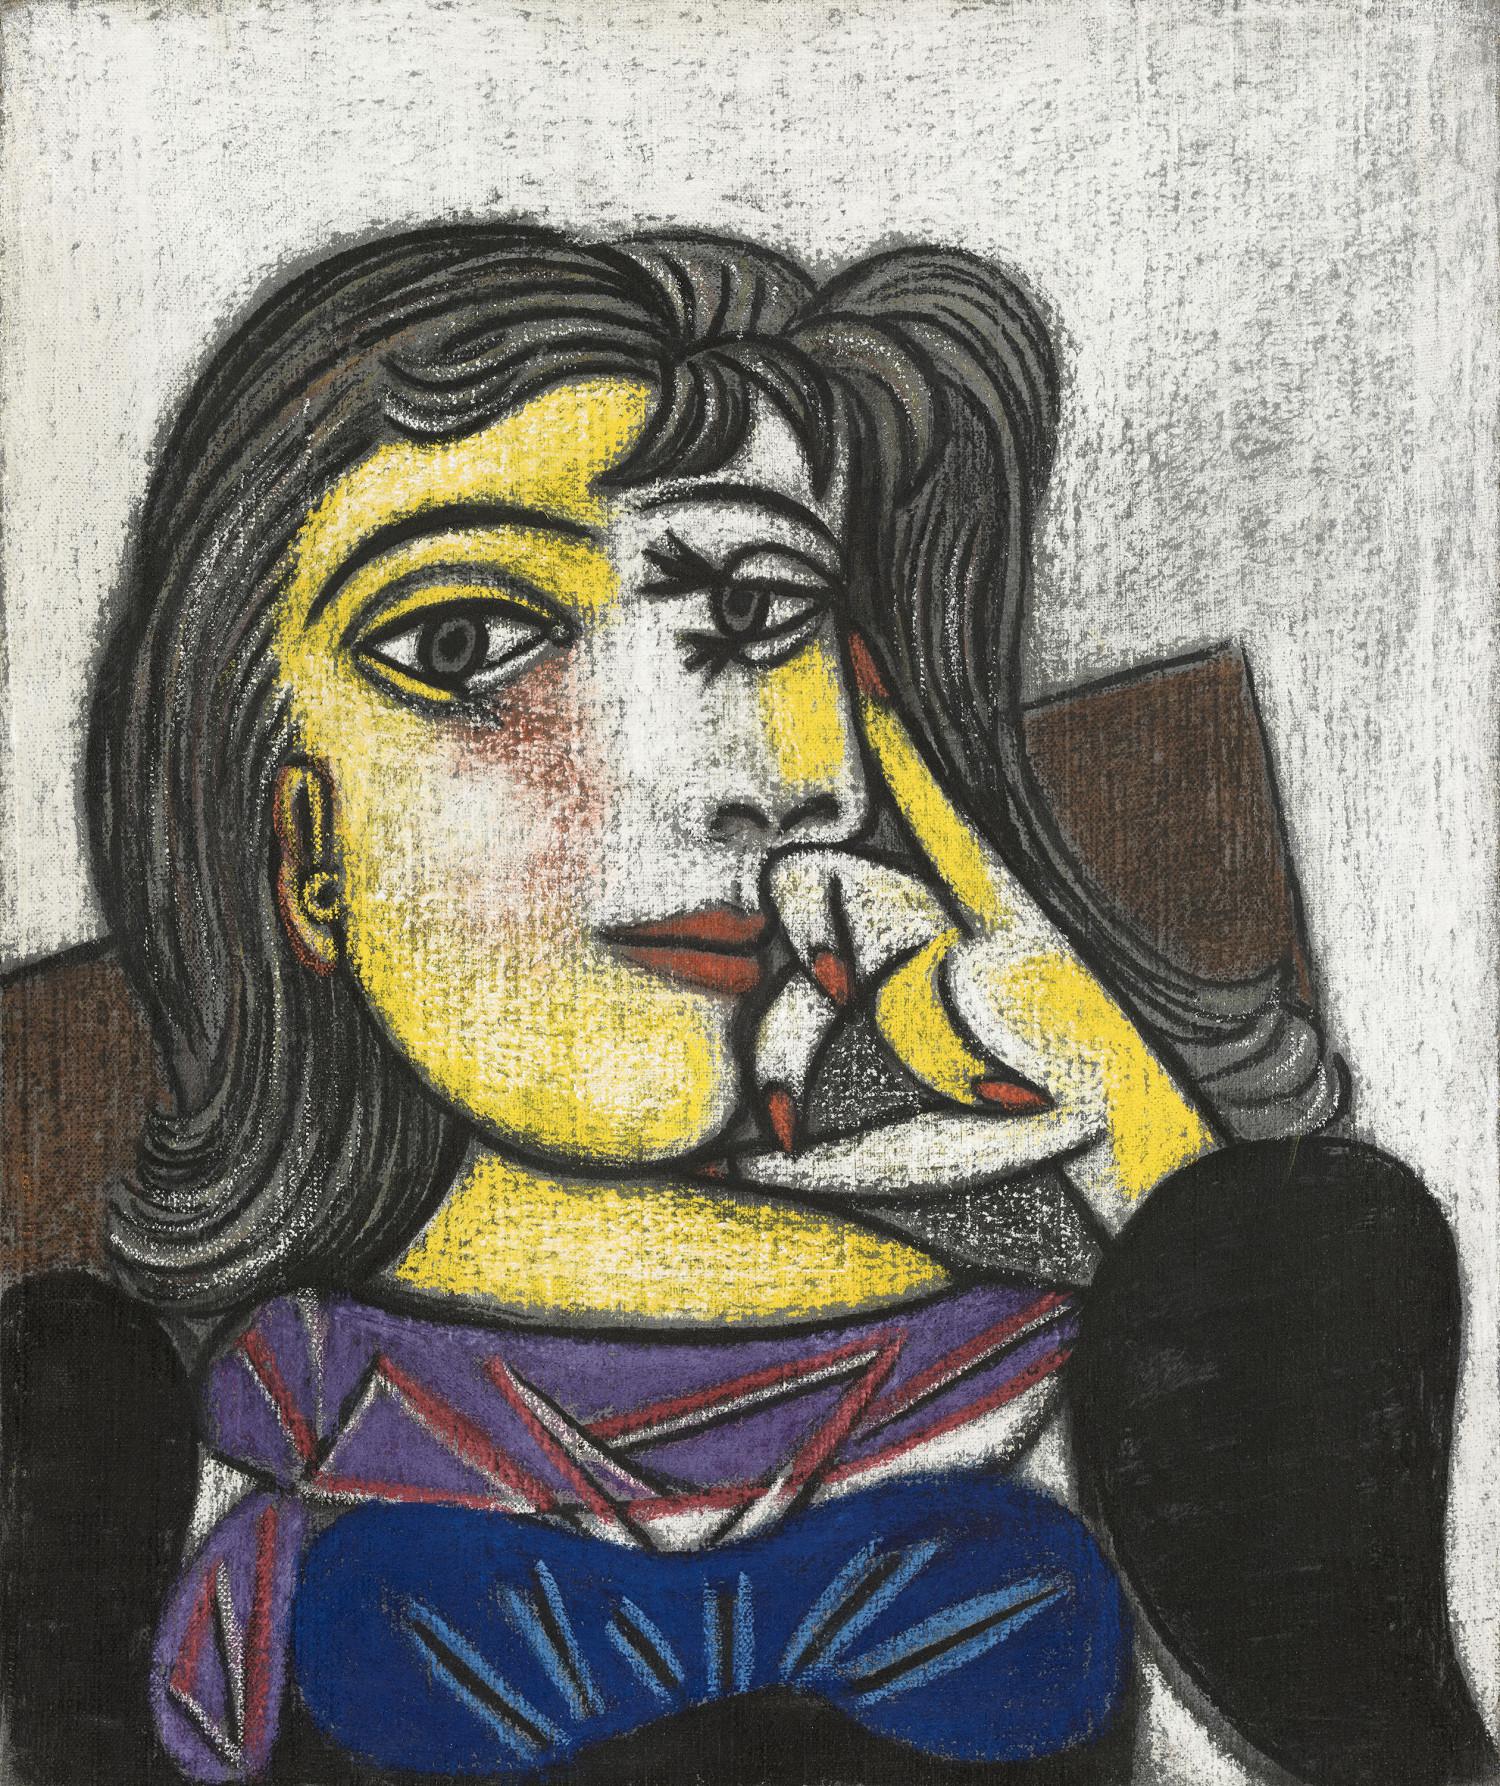 Pablo Picasso, Portrait de Dora Maar, 1937. Olie og pastel på lærred. Musée national Picasso-Paris © Succession Picasso / VISDA 2019